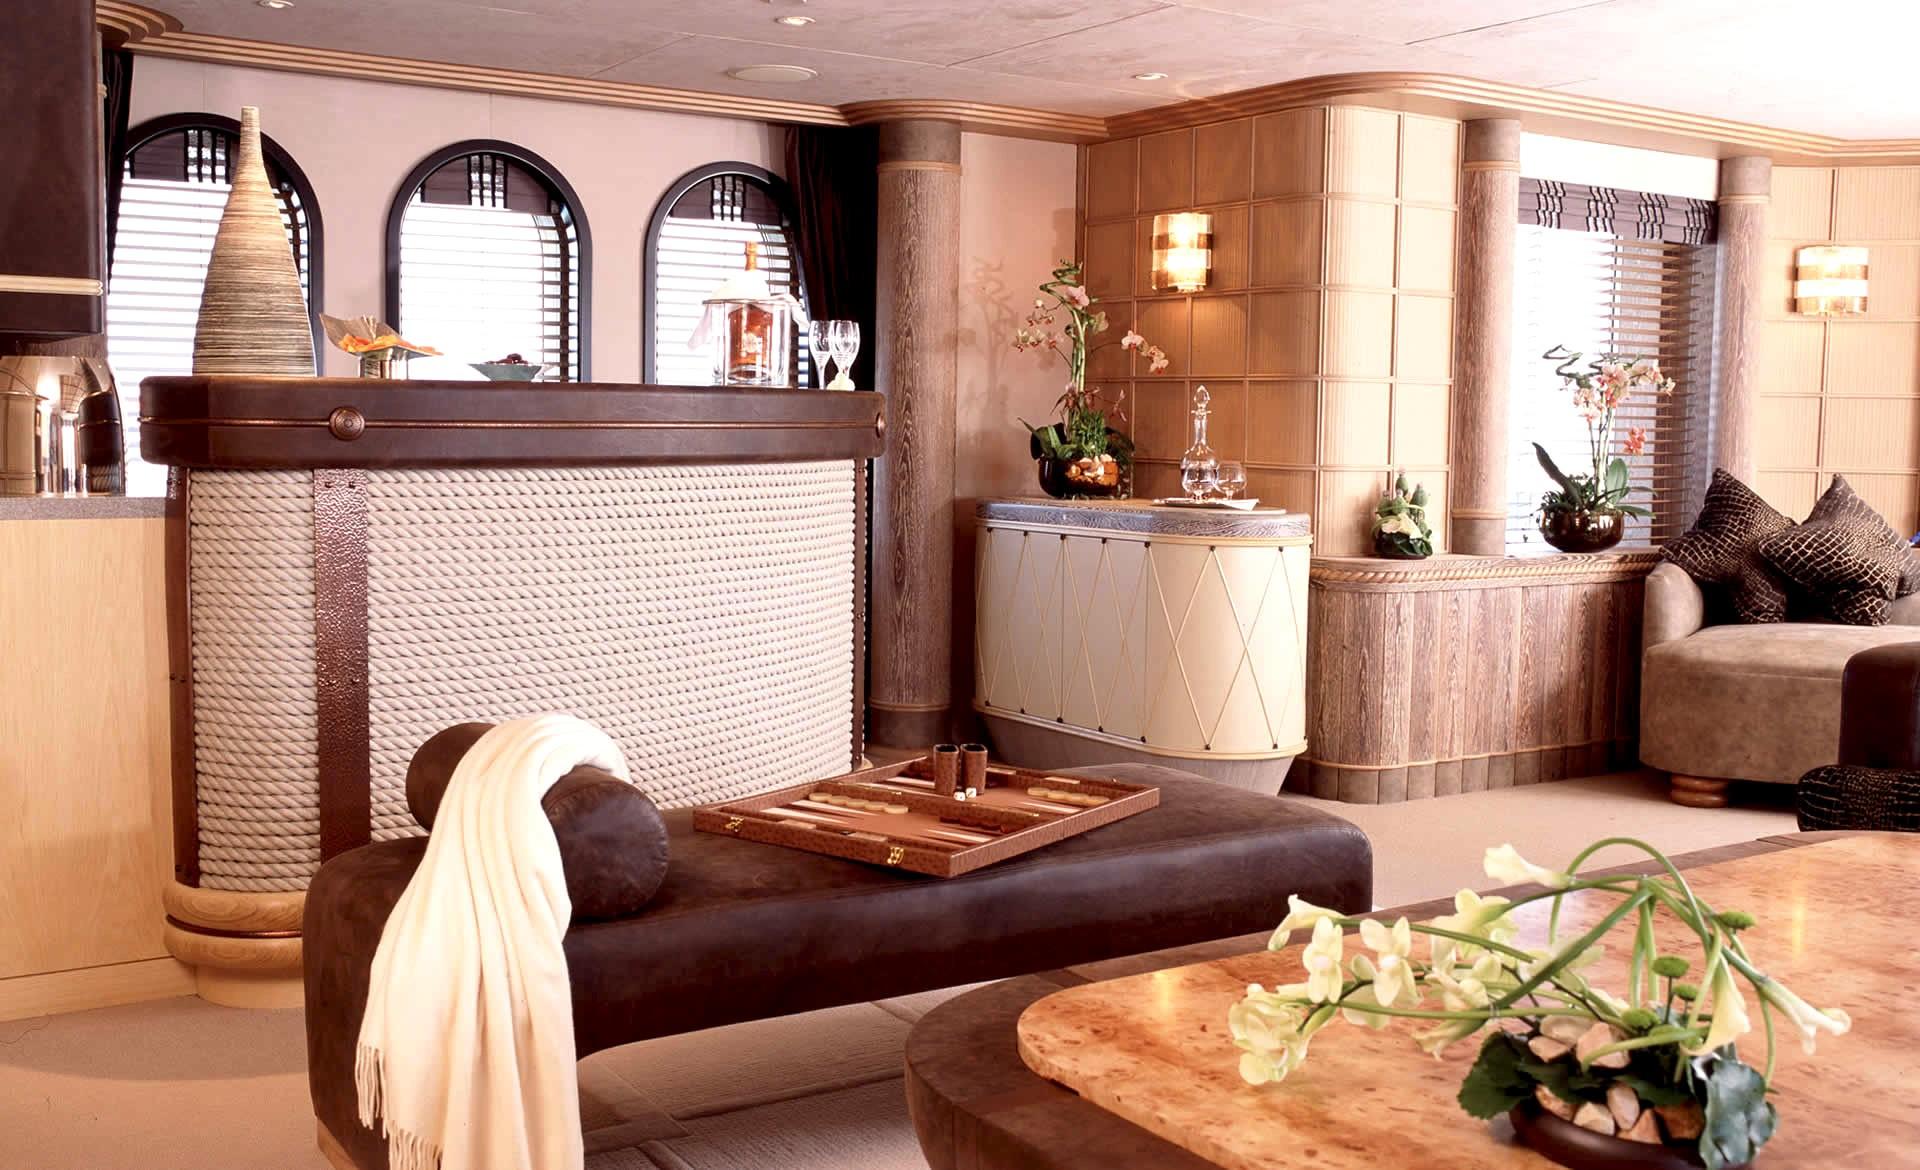 Top Deck Living Area Drinks Bar Aboard Yacht CALYPSO